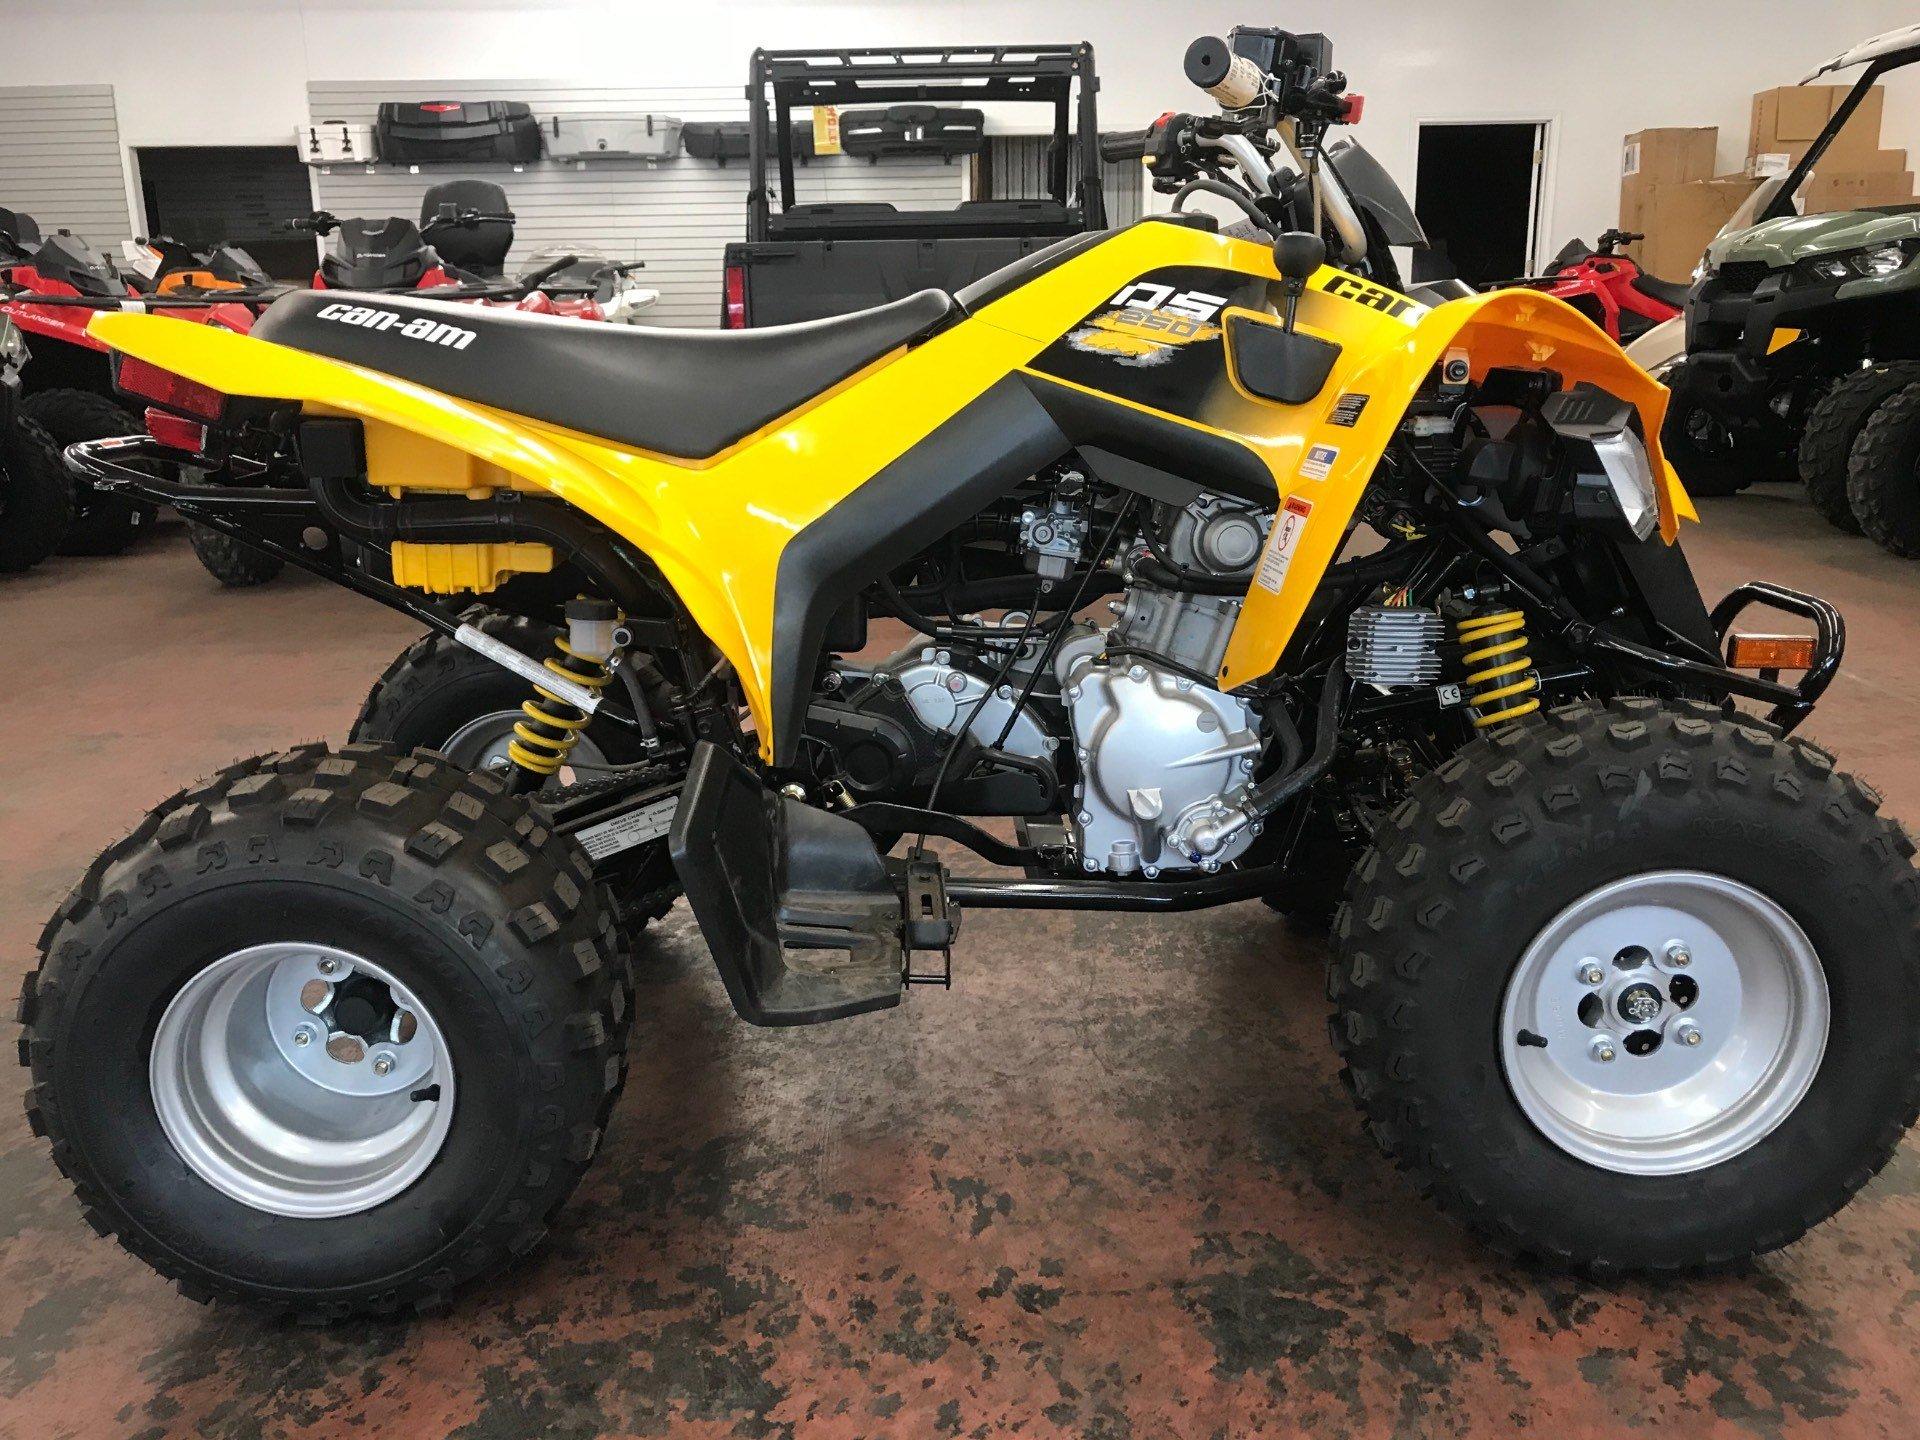 2018 Can-Am DS 250 ATVs Clovis New Mexico C023495R